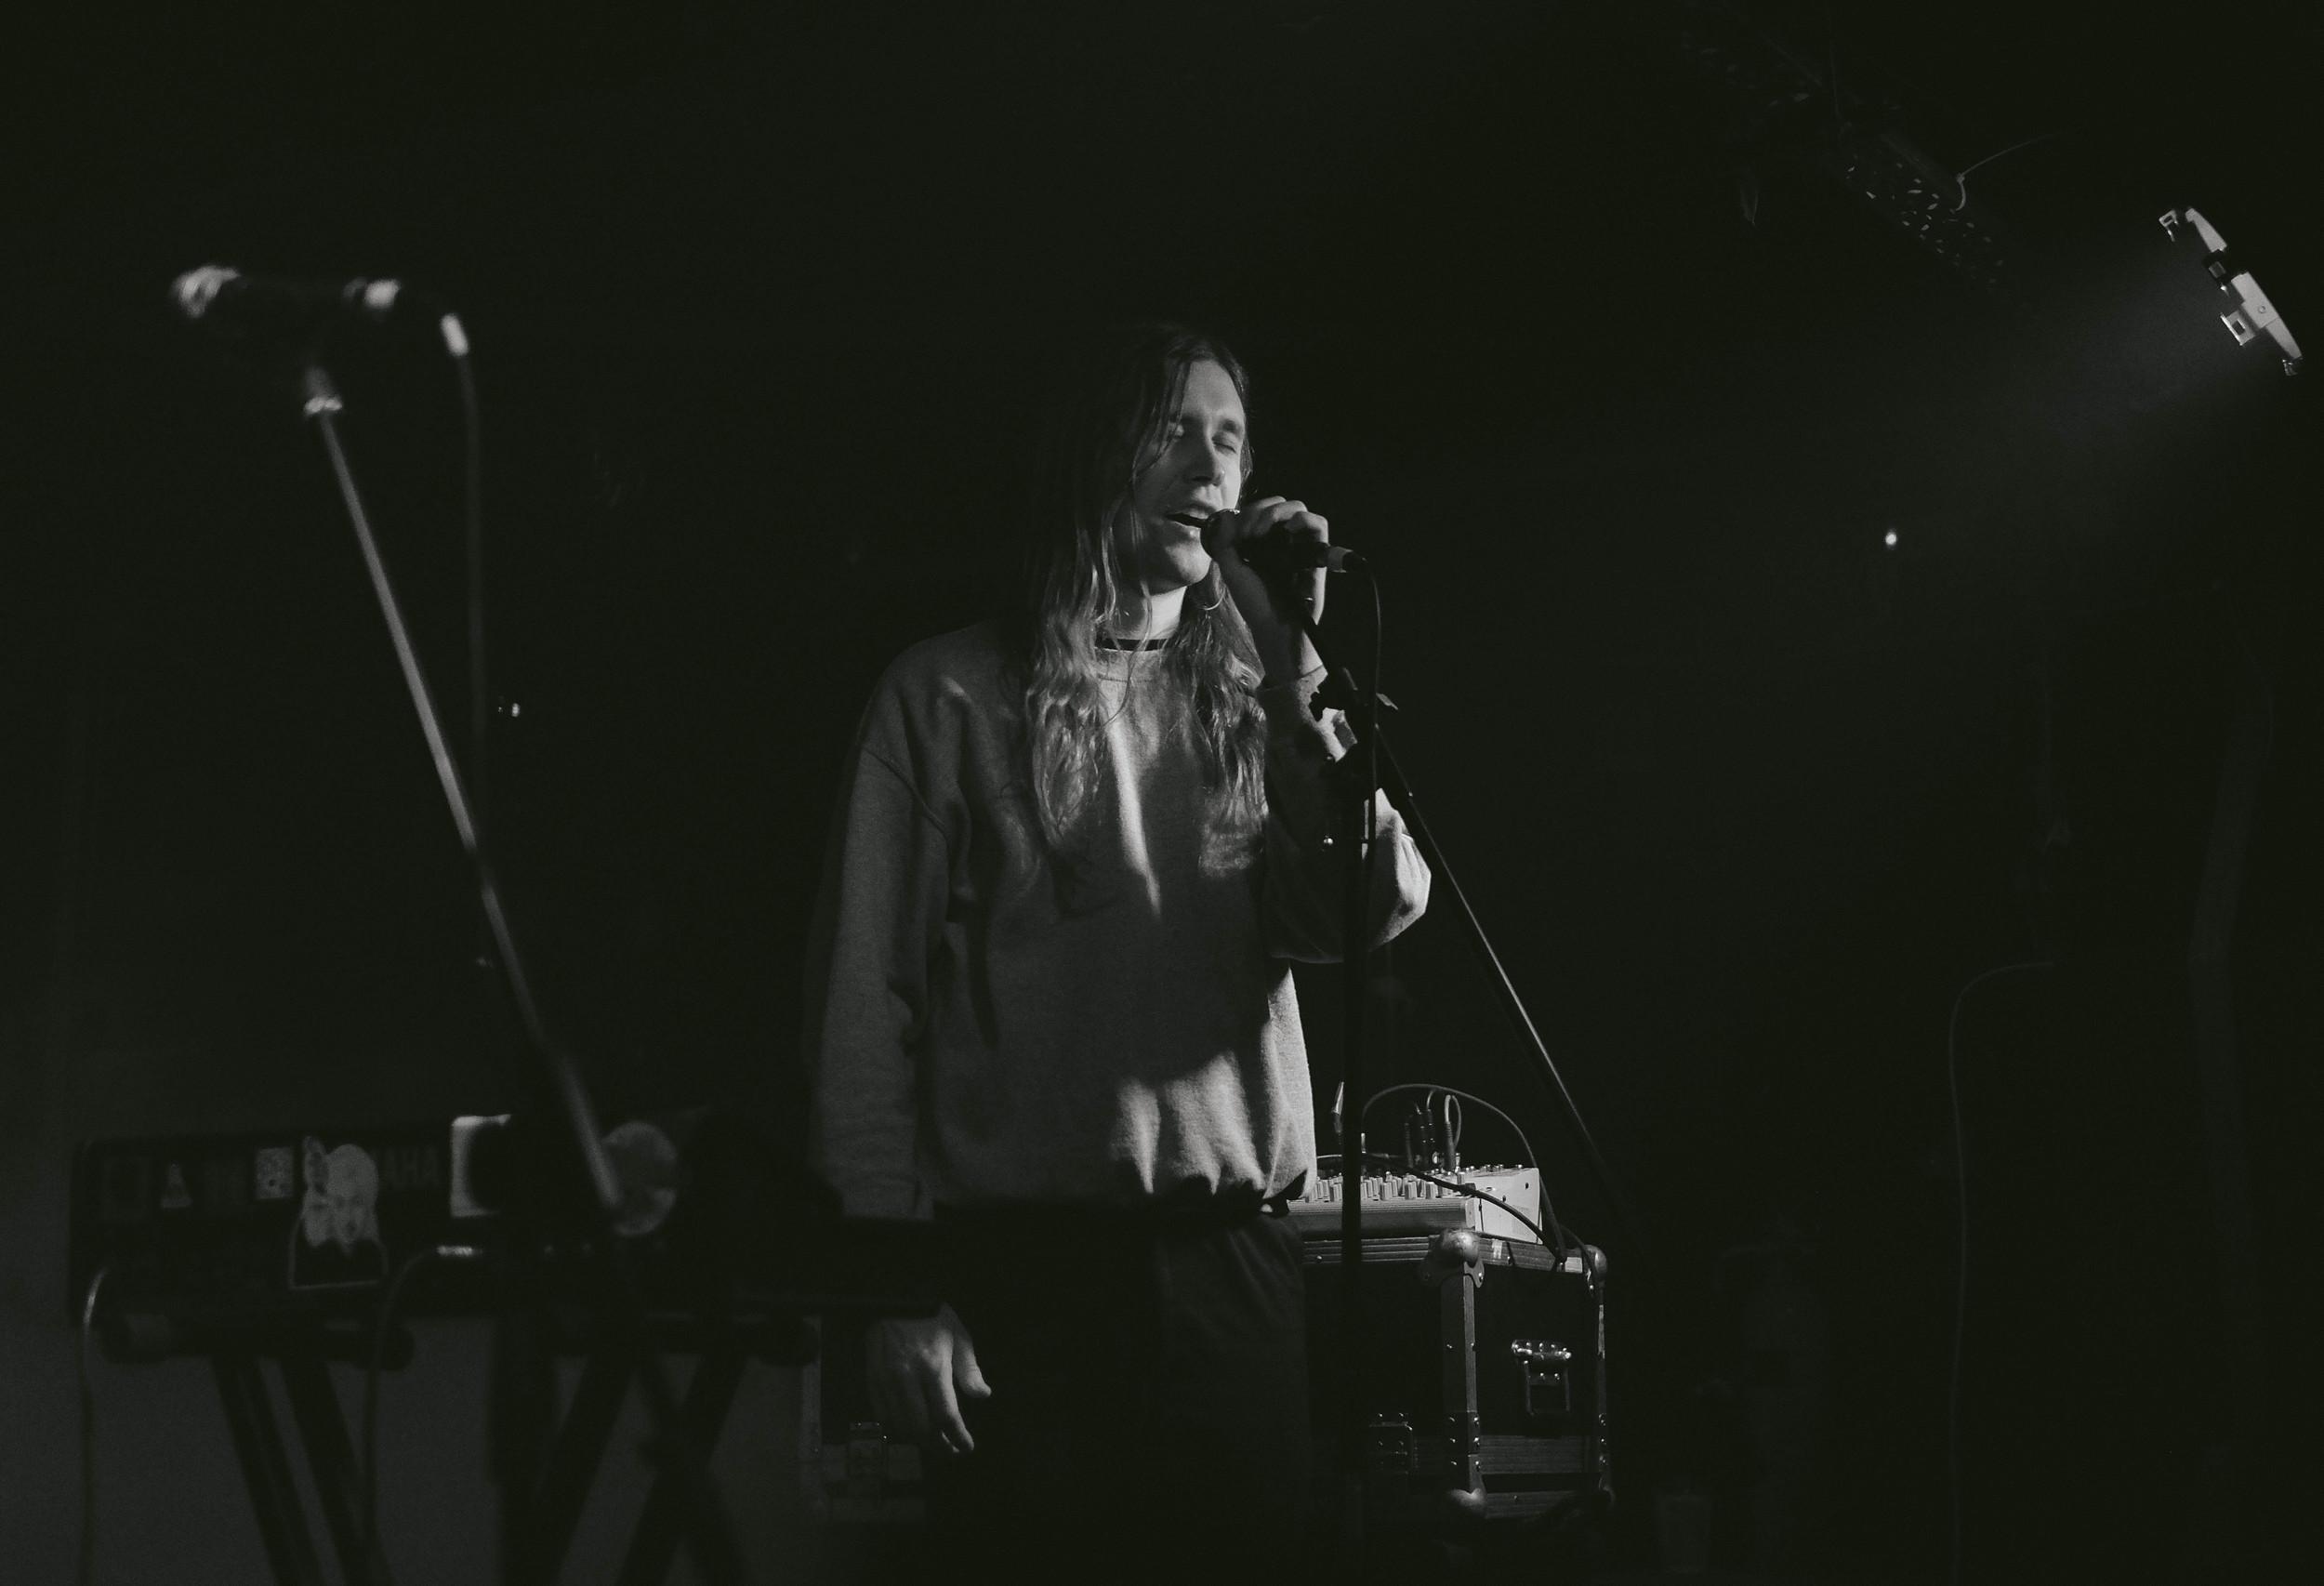 Jaakko Eino Kalevi at Electrowerkz, London 2015